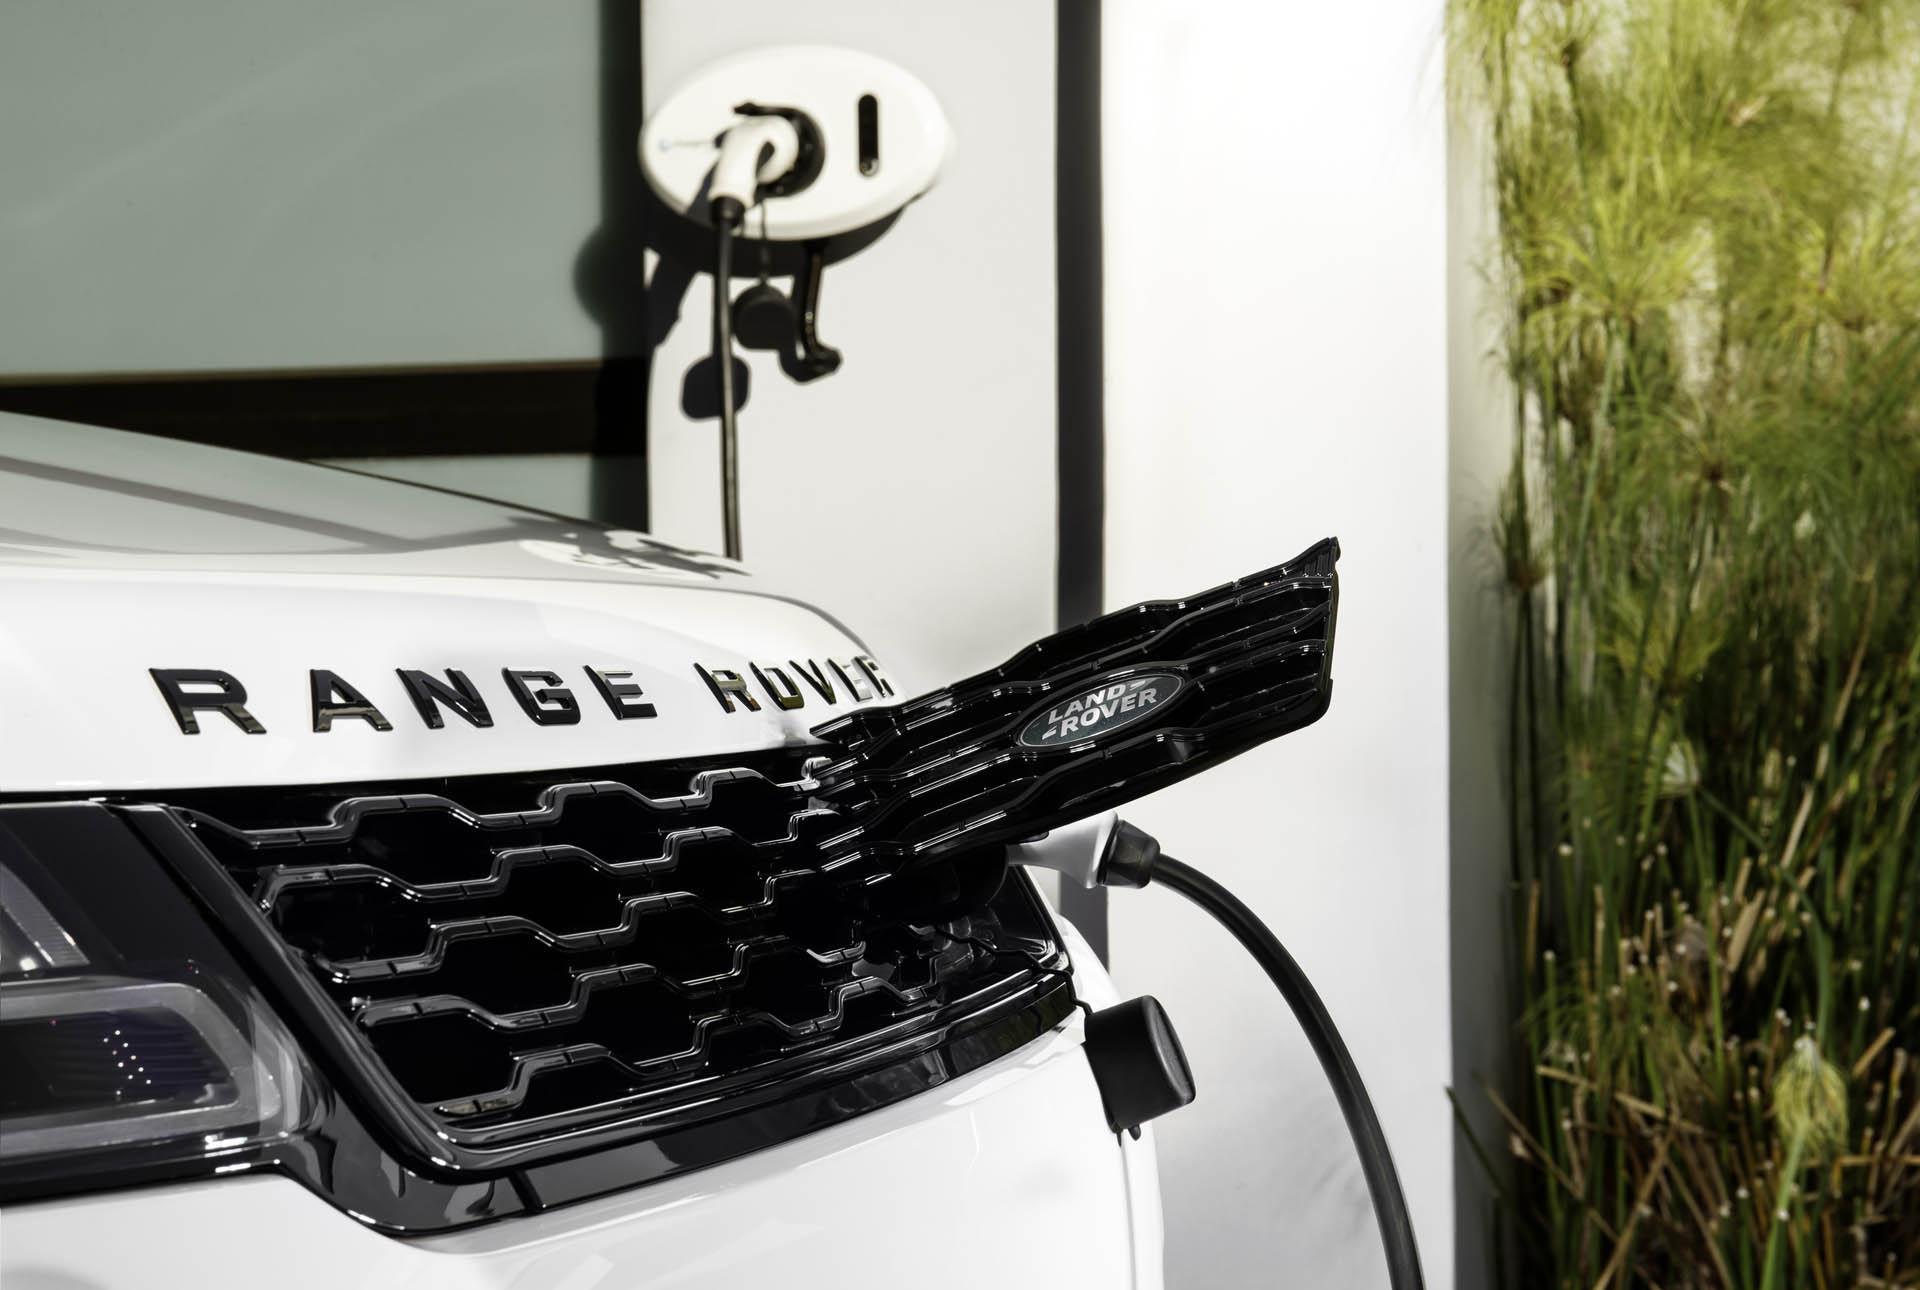 ranger-rover-sport-the-he-moi-se-trinh-lang-sau-4-nam-im-lim